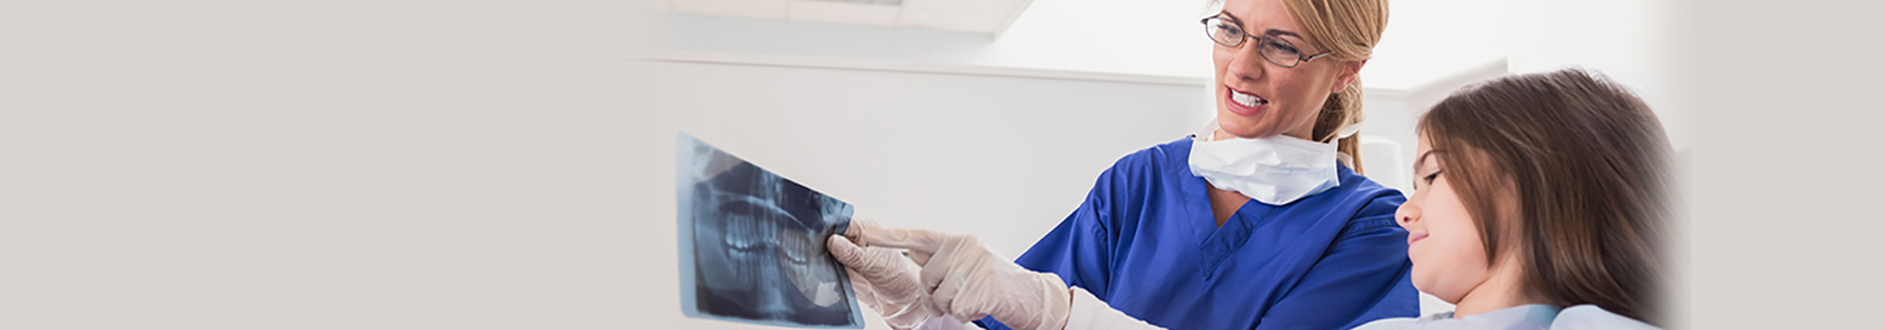 Dentist Montmorency - Emergency Dentistry | Dental Clinic Montmorency